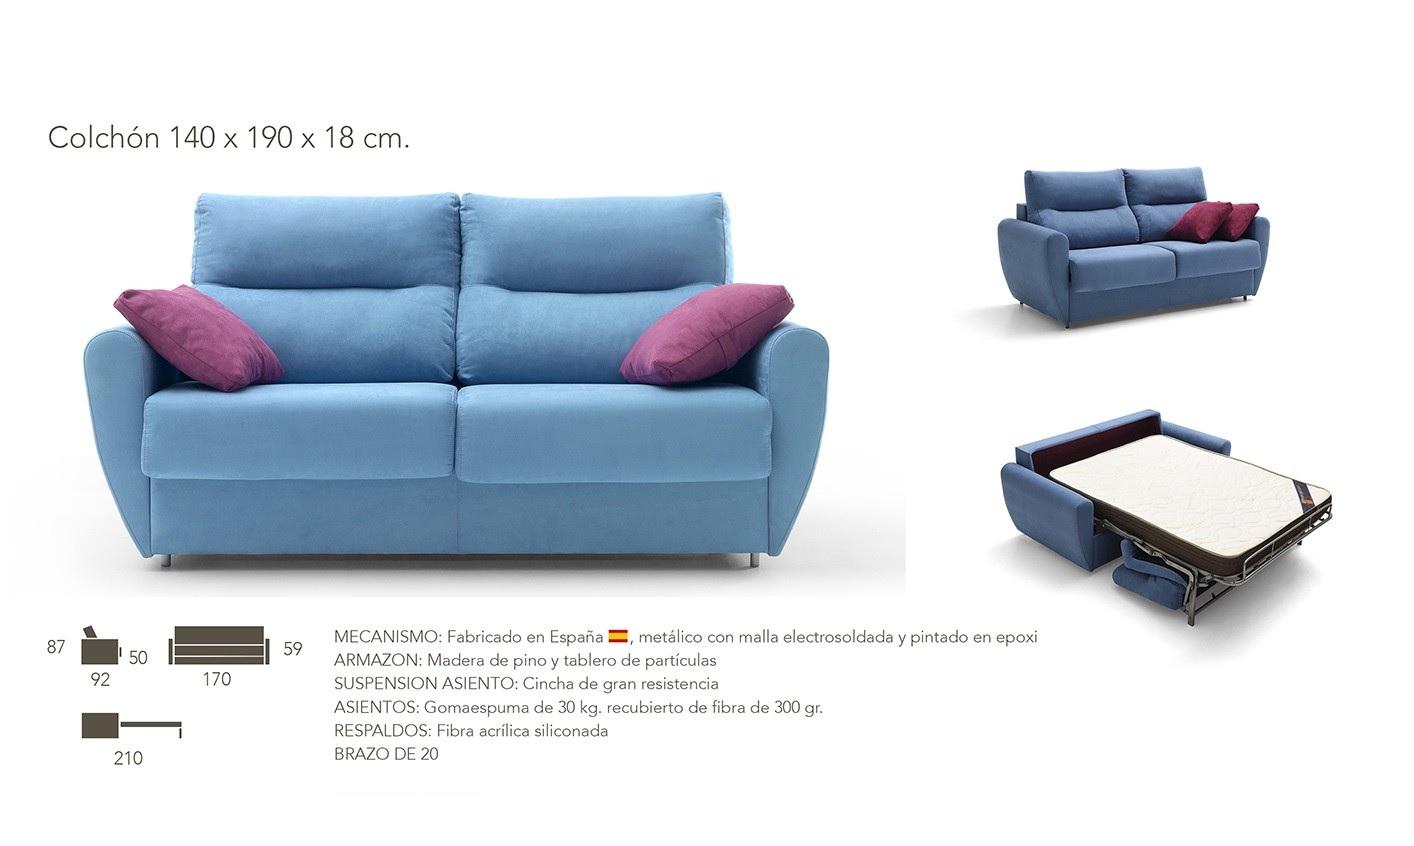 sofas-camas-Frances-muebles-paco-caballero-1708-5c8d2985bcfbe